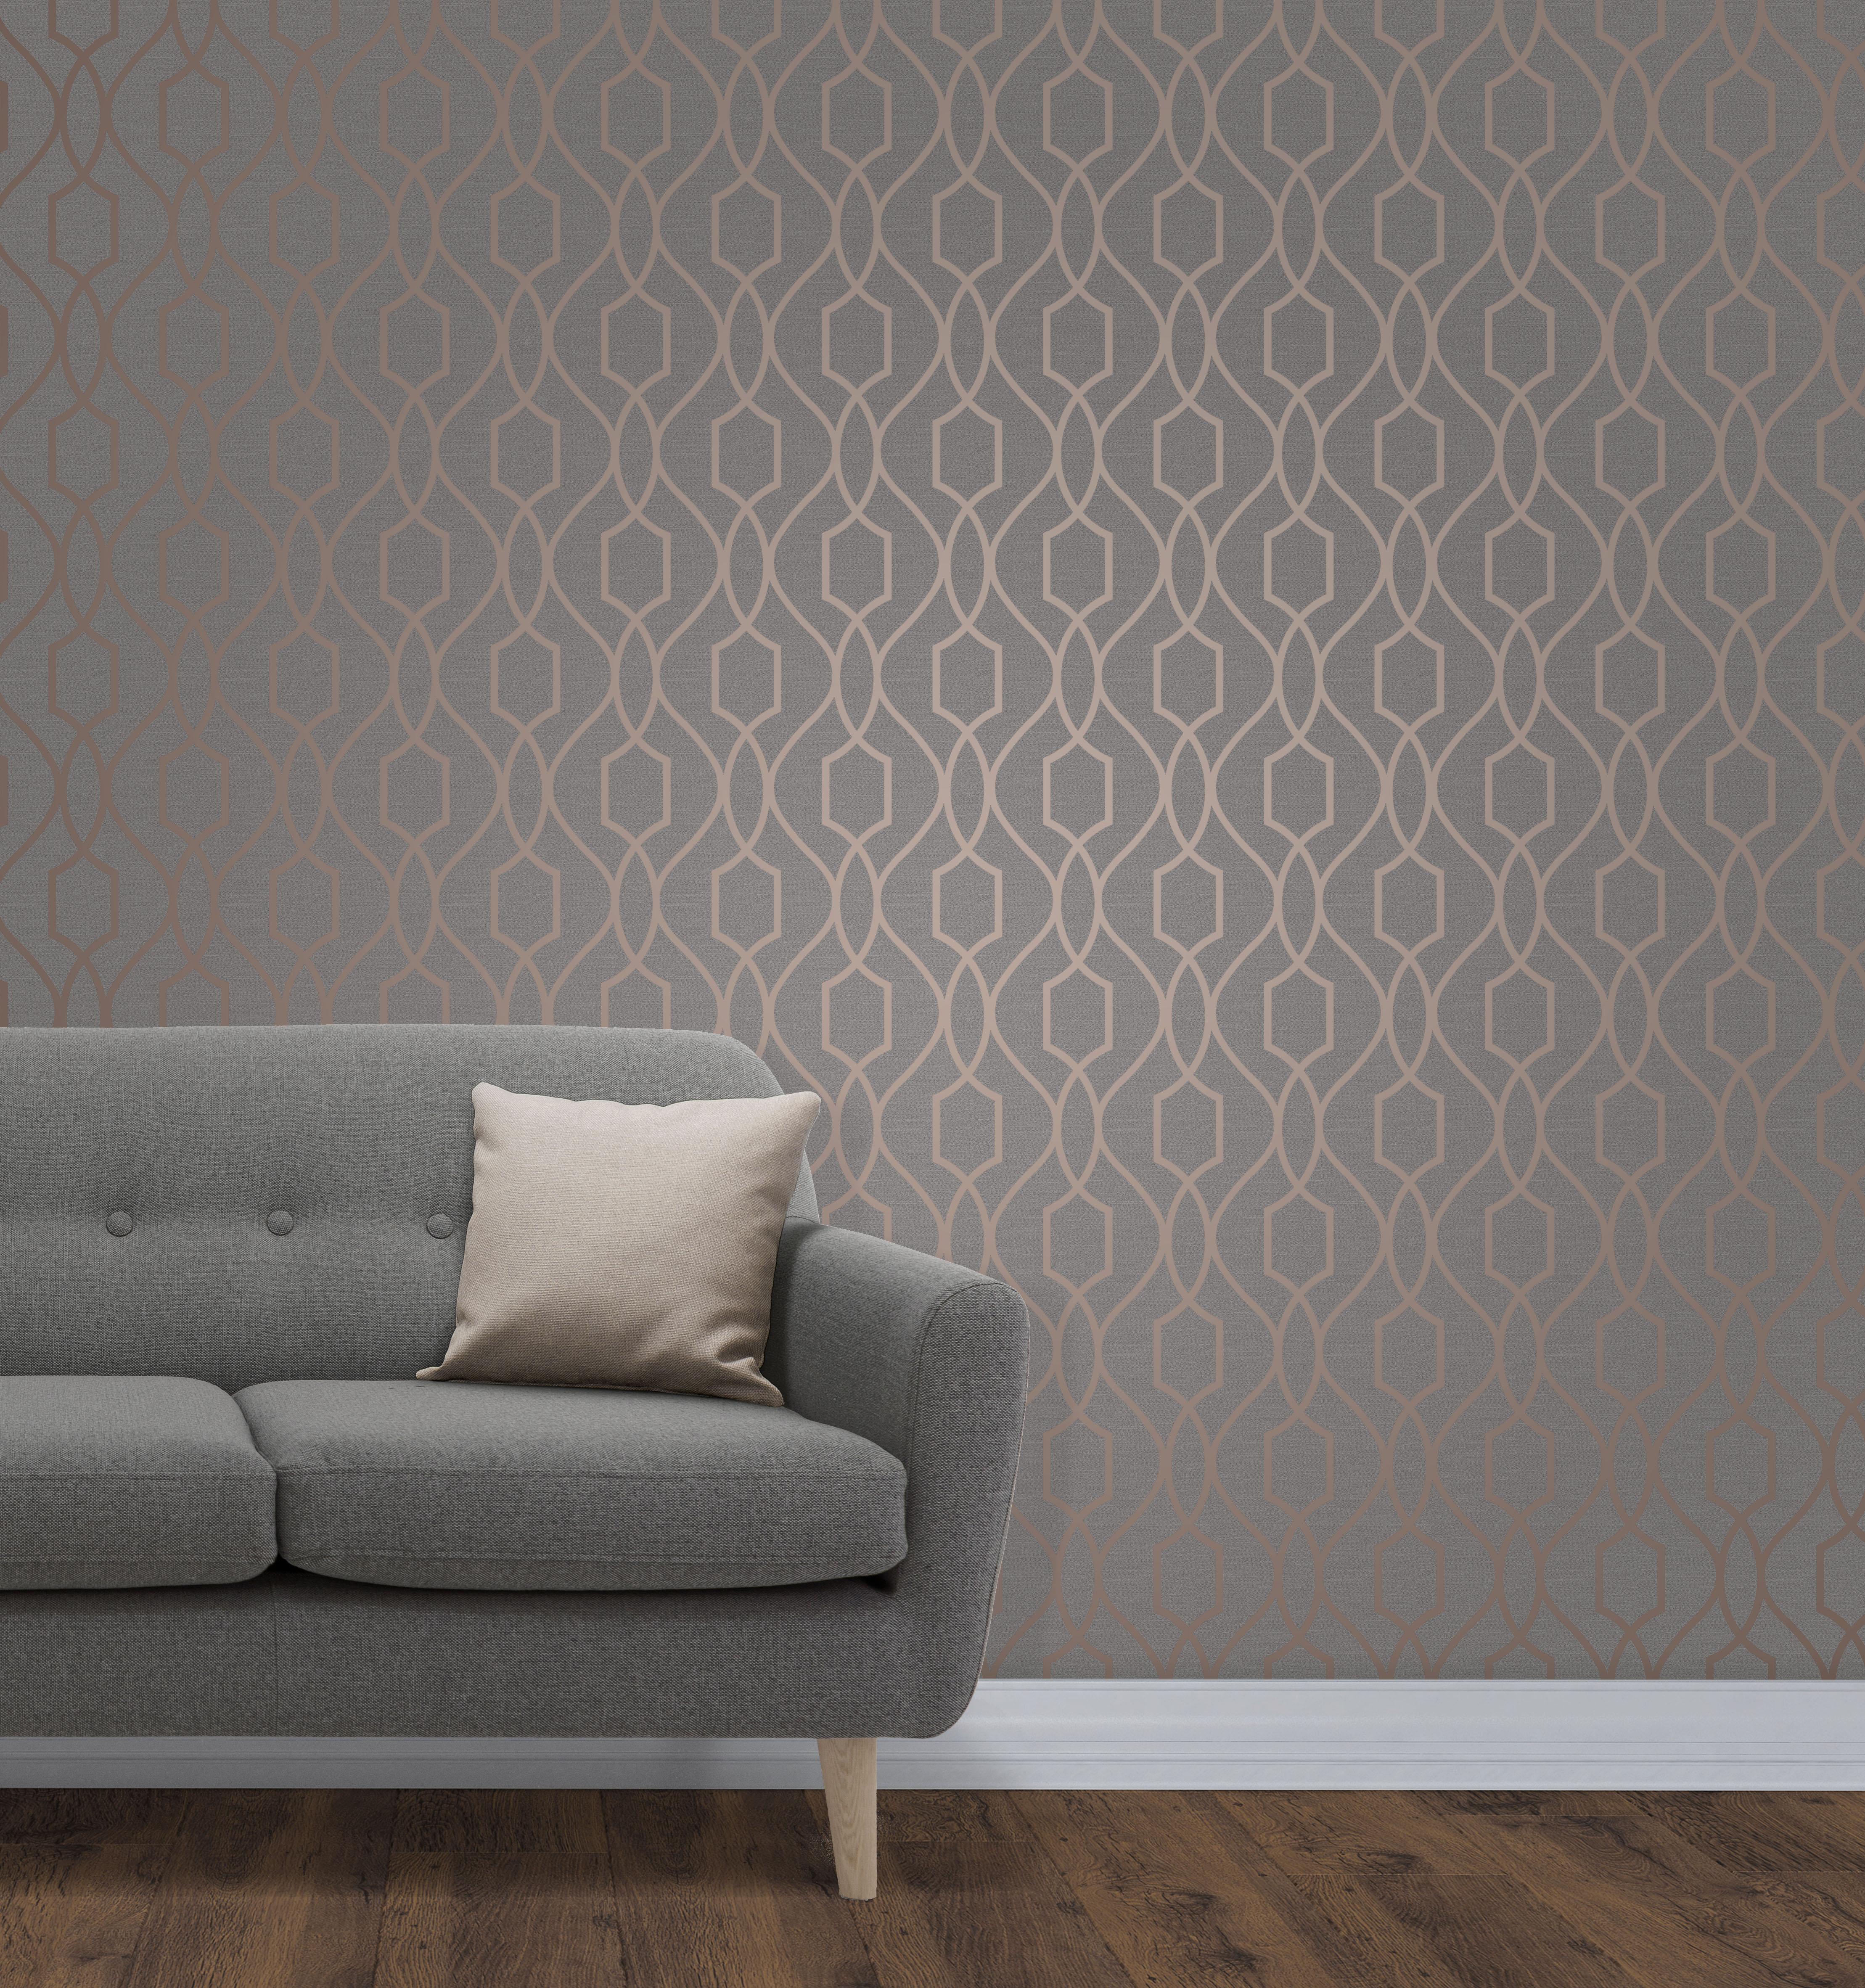 Geometric Wallpaper Metallic Shiny Copper Charcoal Apex 3D Modern Fine Decor